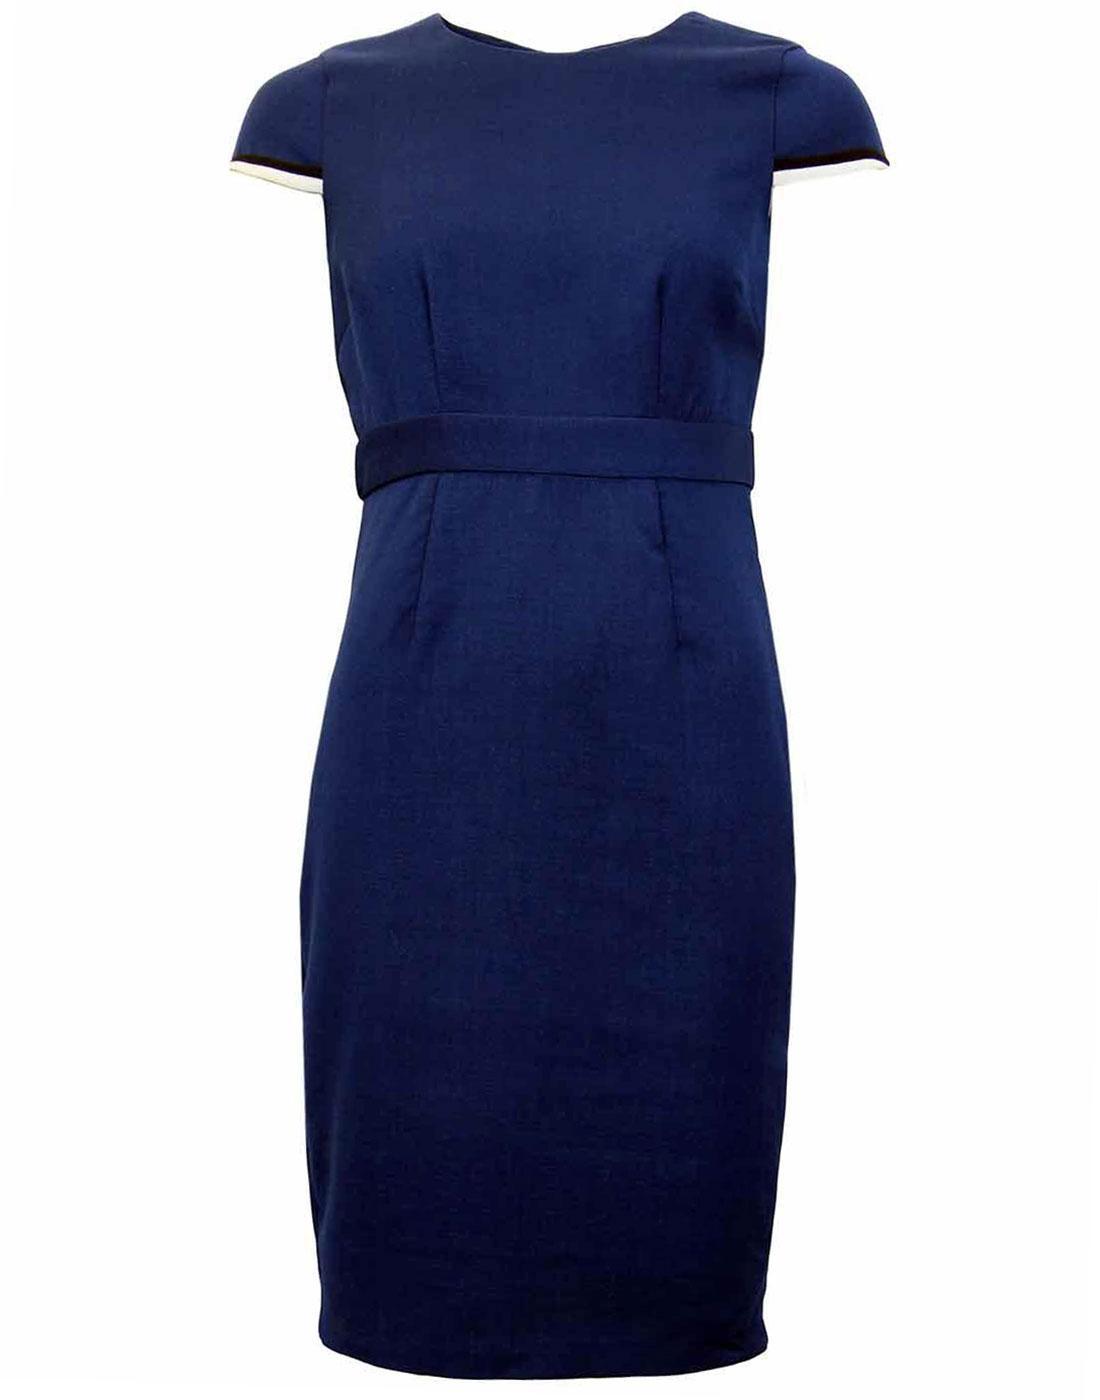 Gina DARLING Retro 50s Structured Pencil Dress